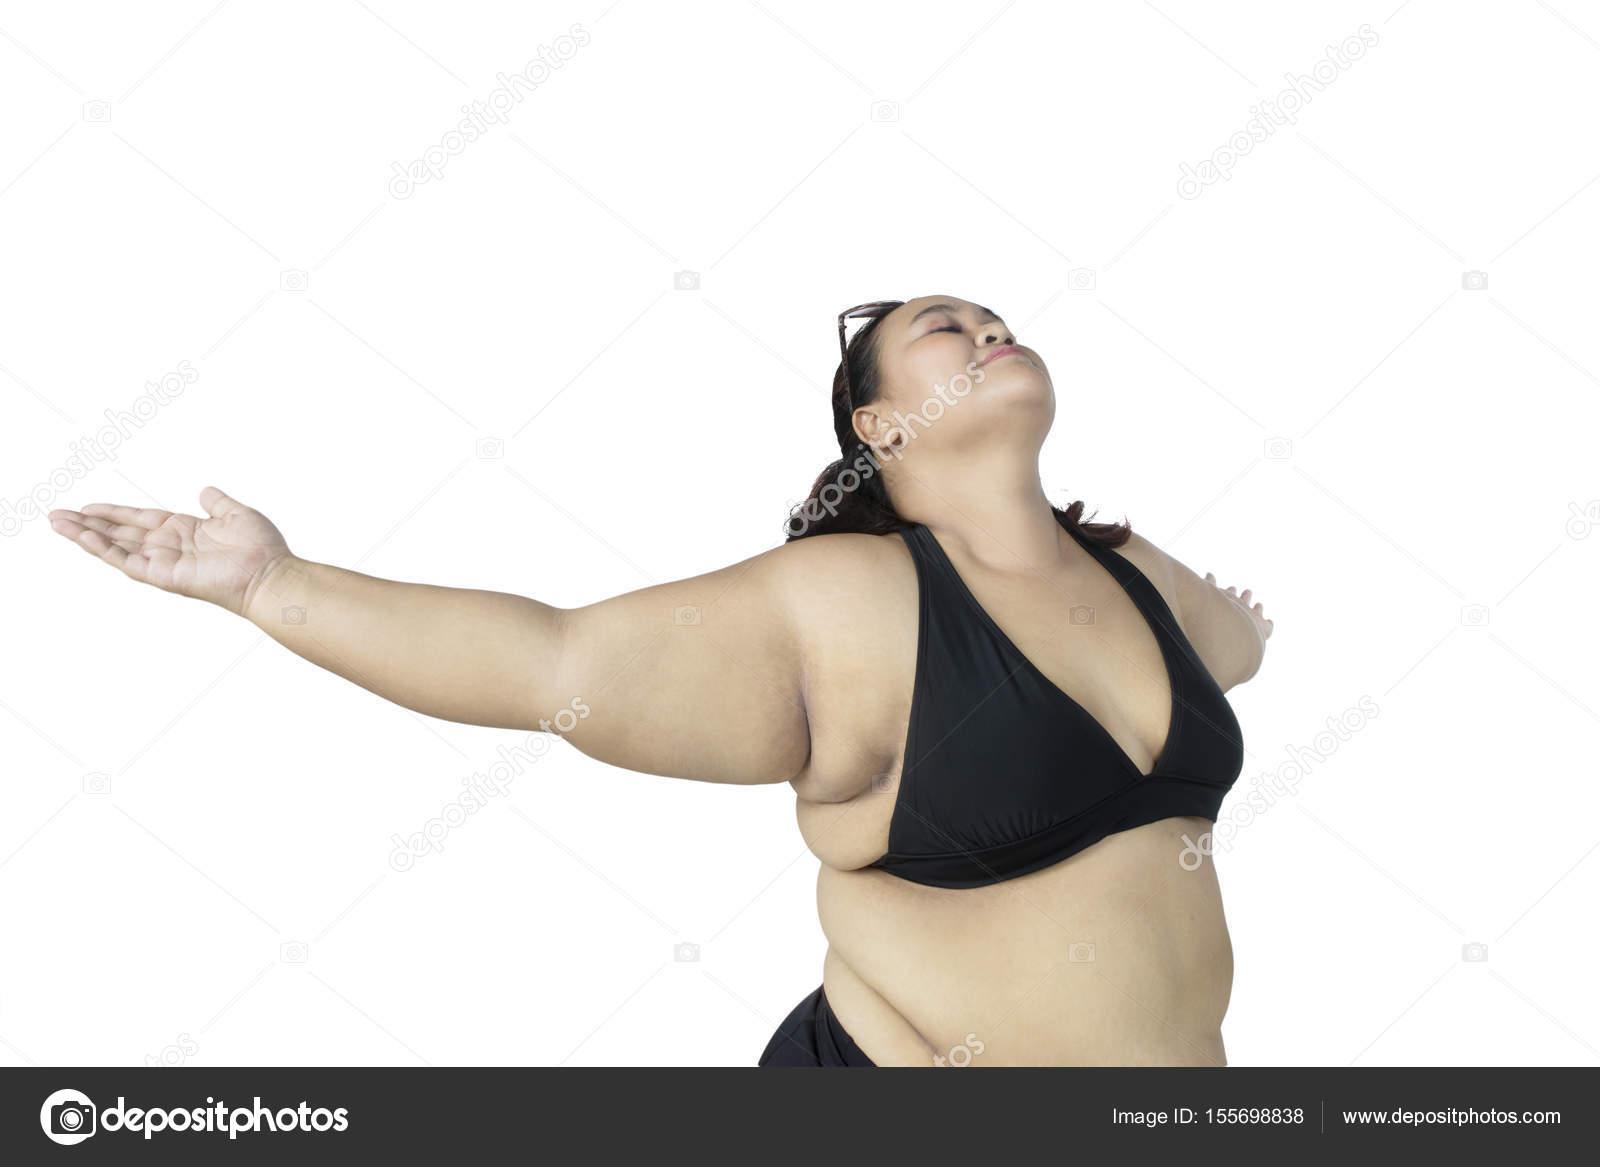 Dicke Frau mit Bikini posiert im studio — Stockfoto © realinemedia ... ecc5e58f84